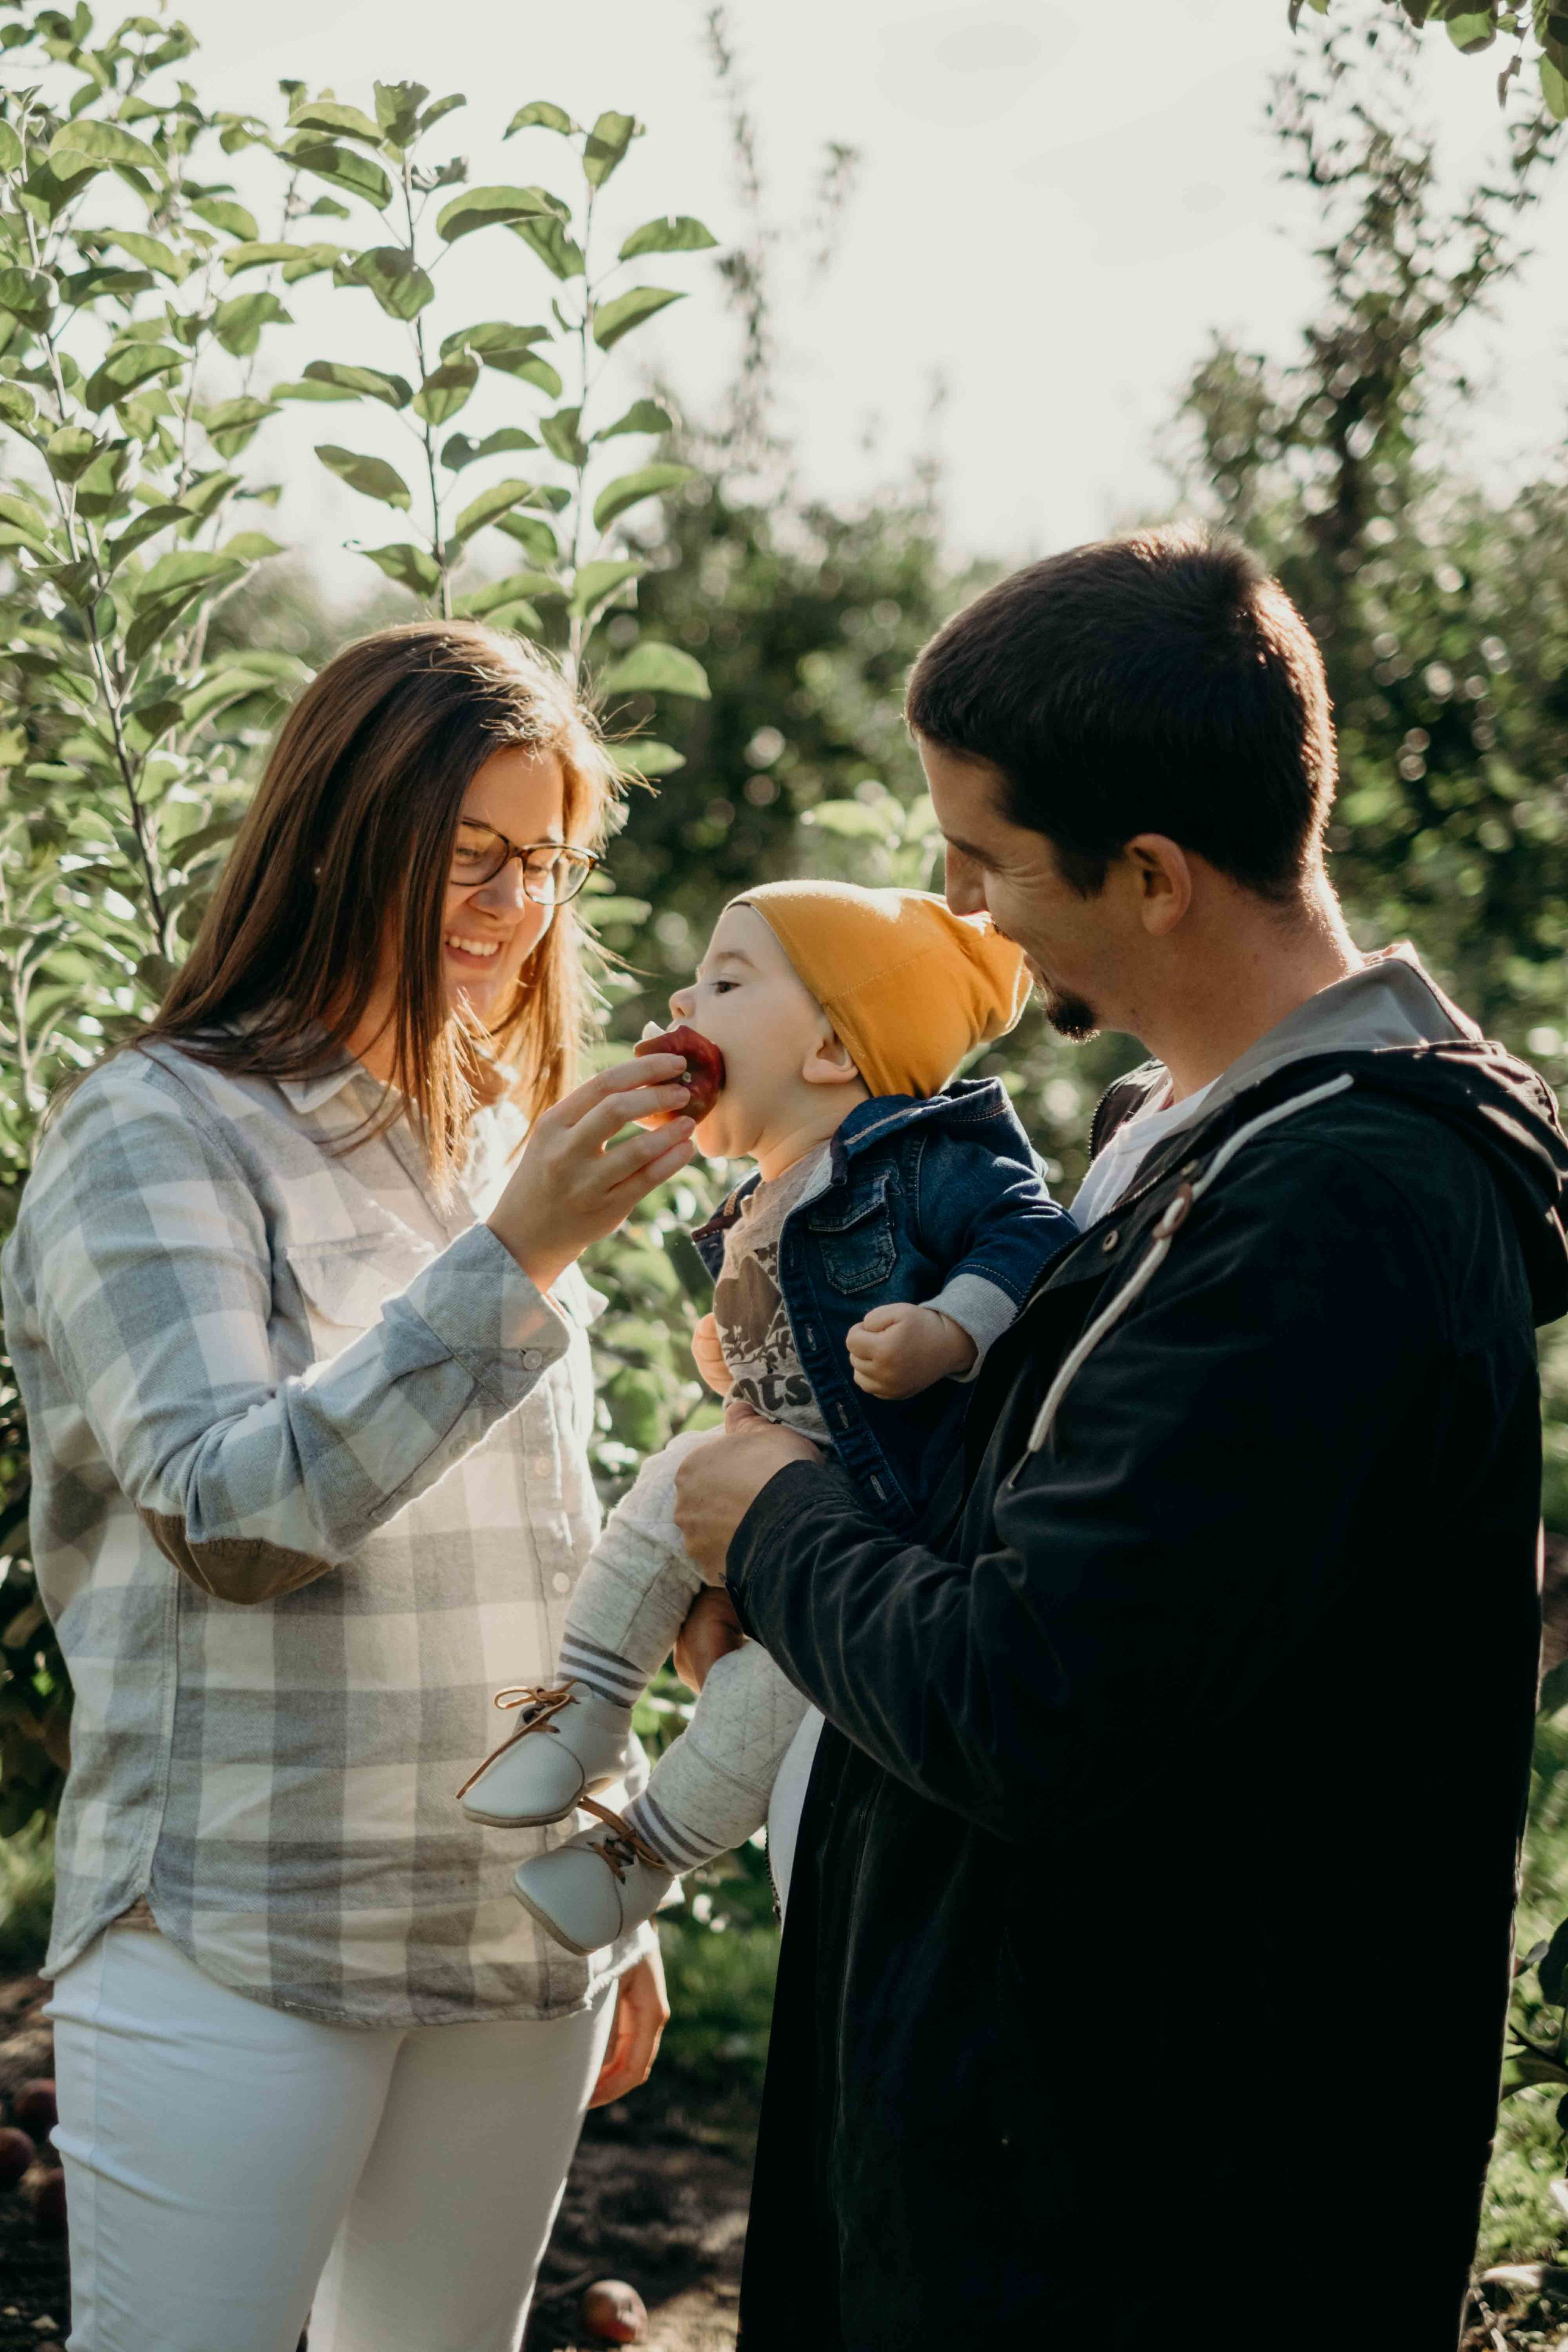 20180922_Toronto Lifestyle Family Photographer - Ali Happer Photo_13.jpg